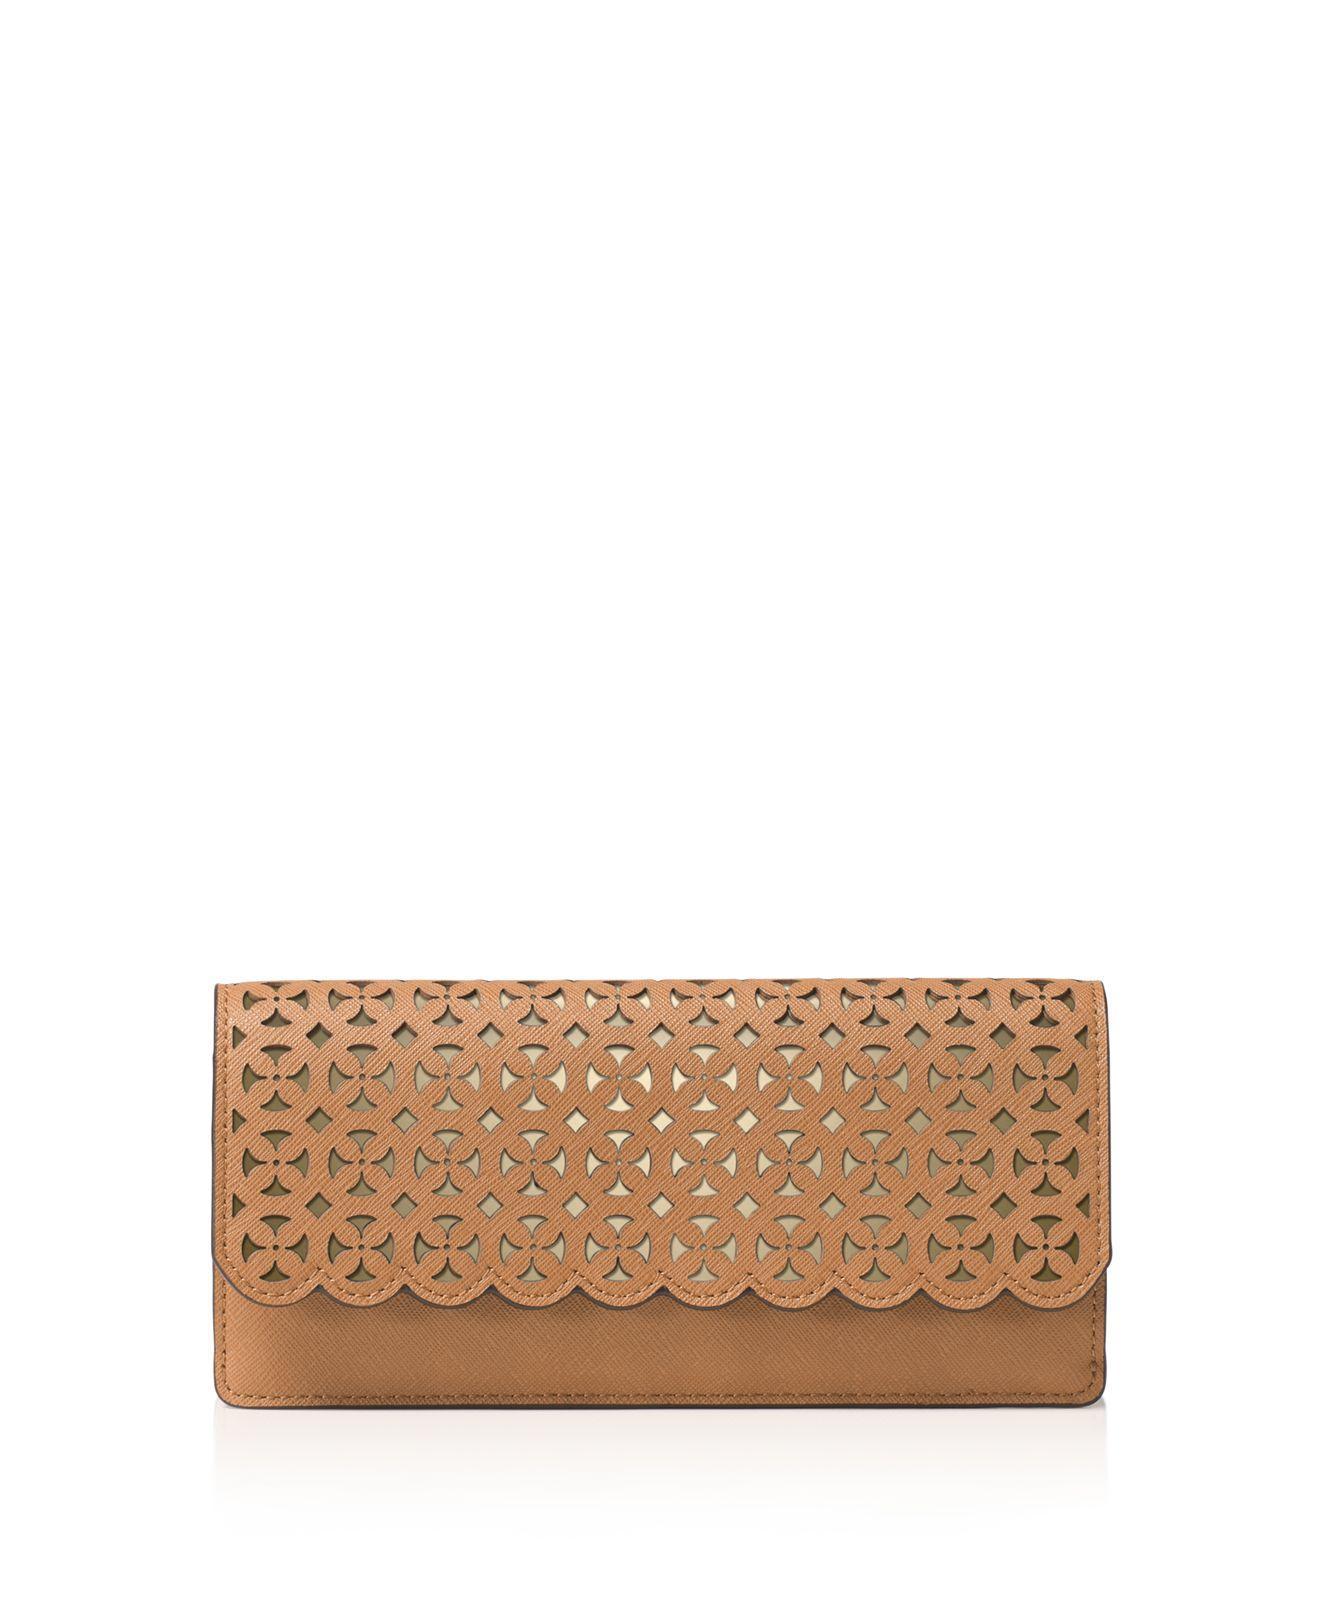 a1d67b7dbdad Lyst - MICHAEL Michael Kors Desi Flat Saffiano Leather Wallet in ...